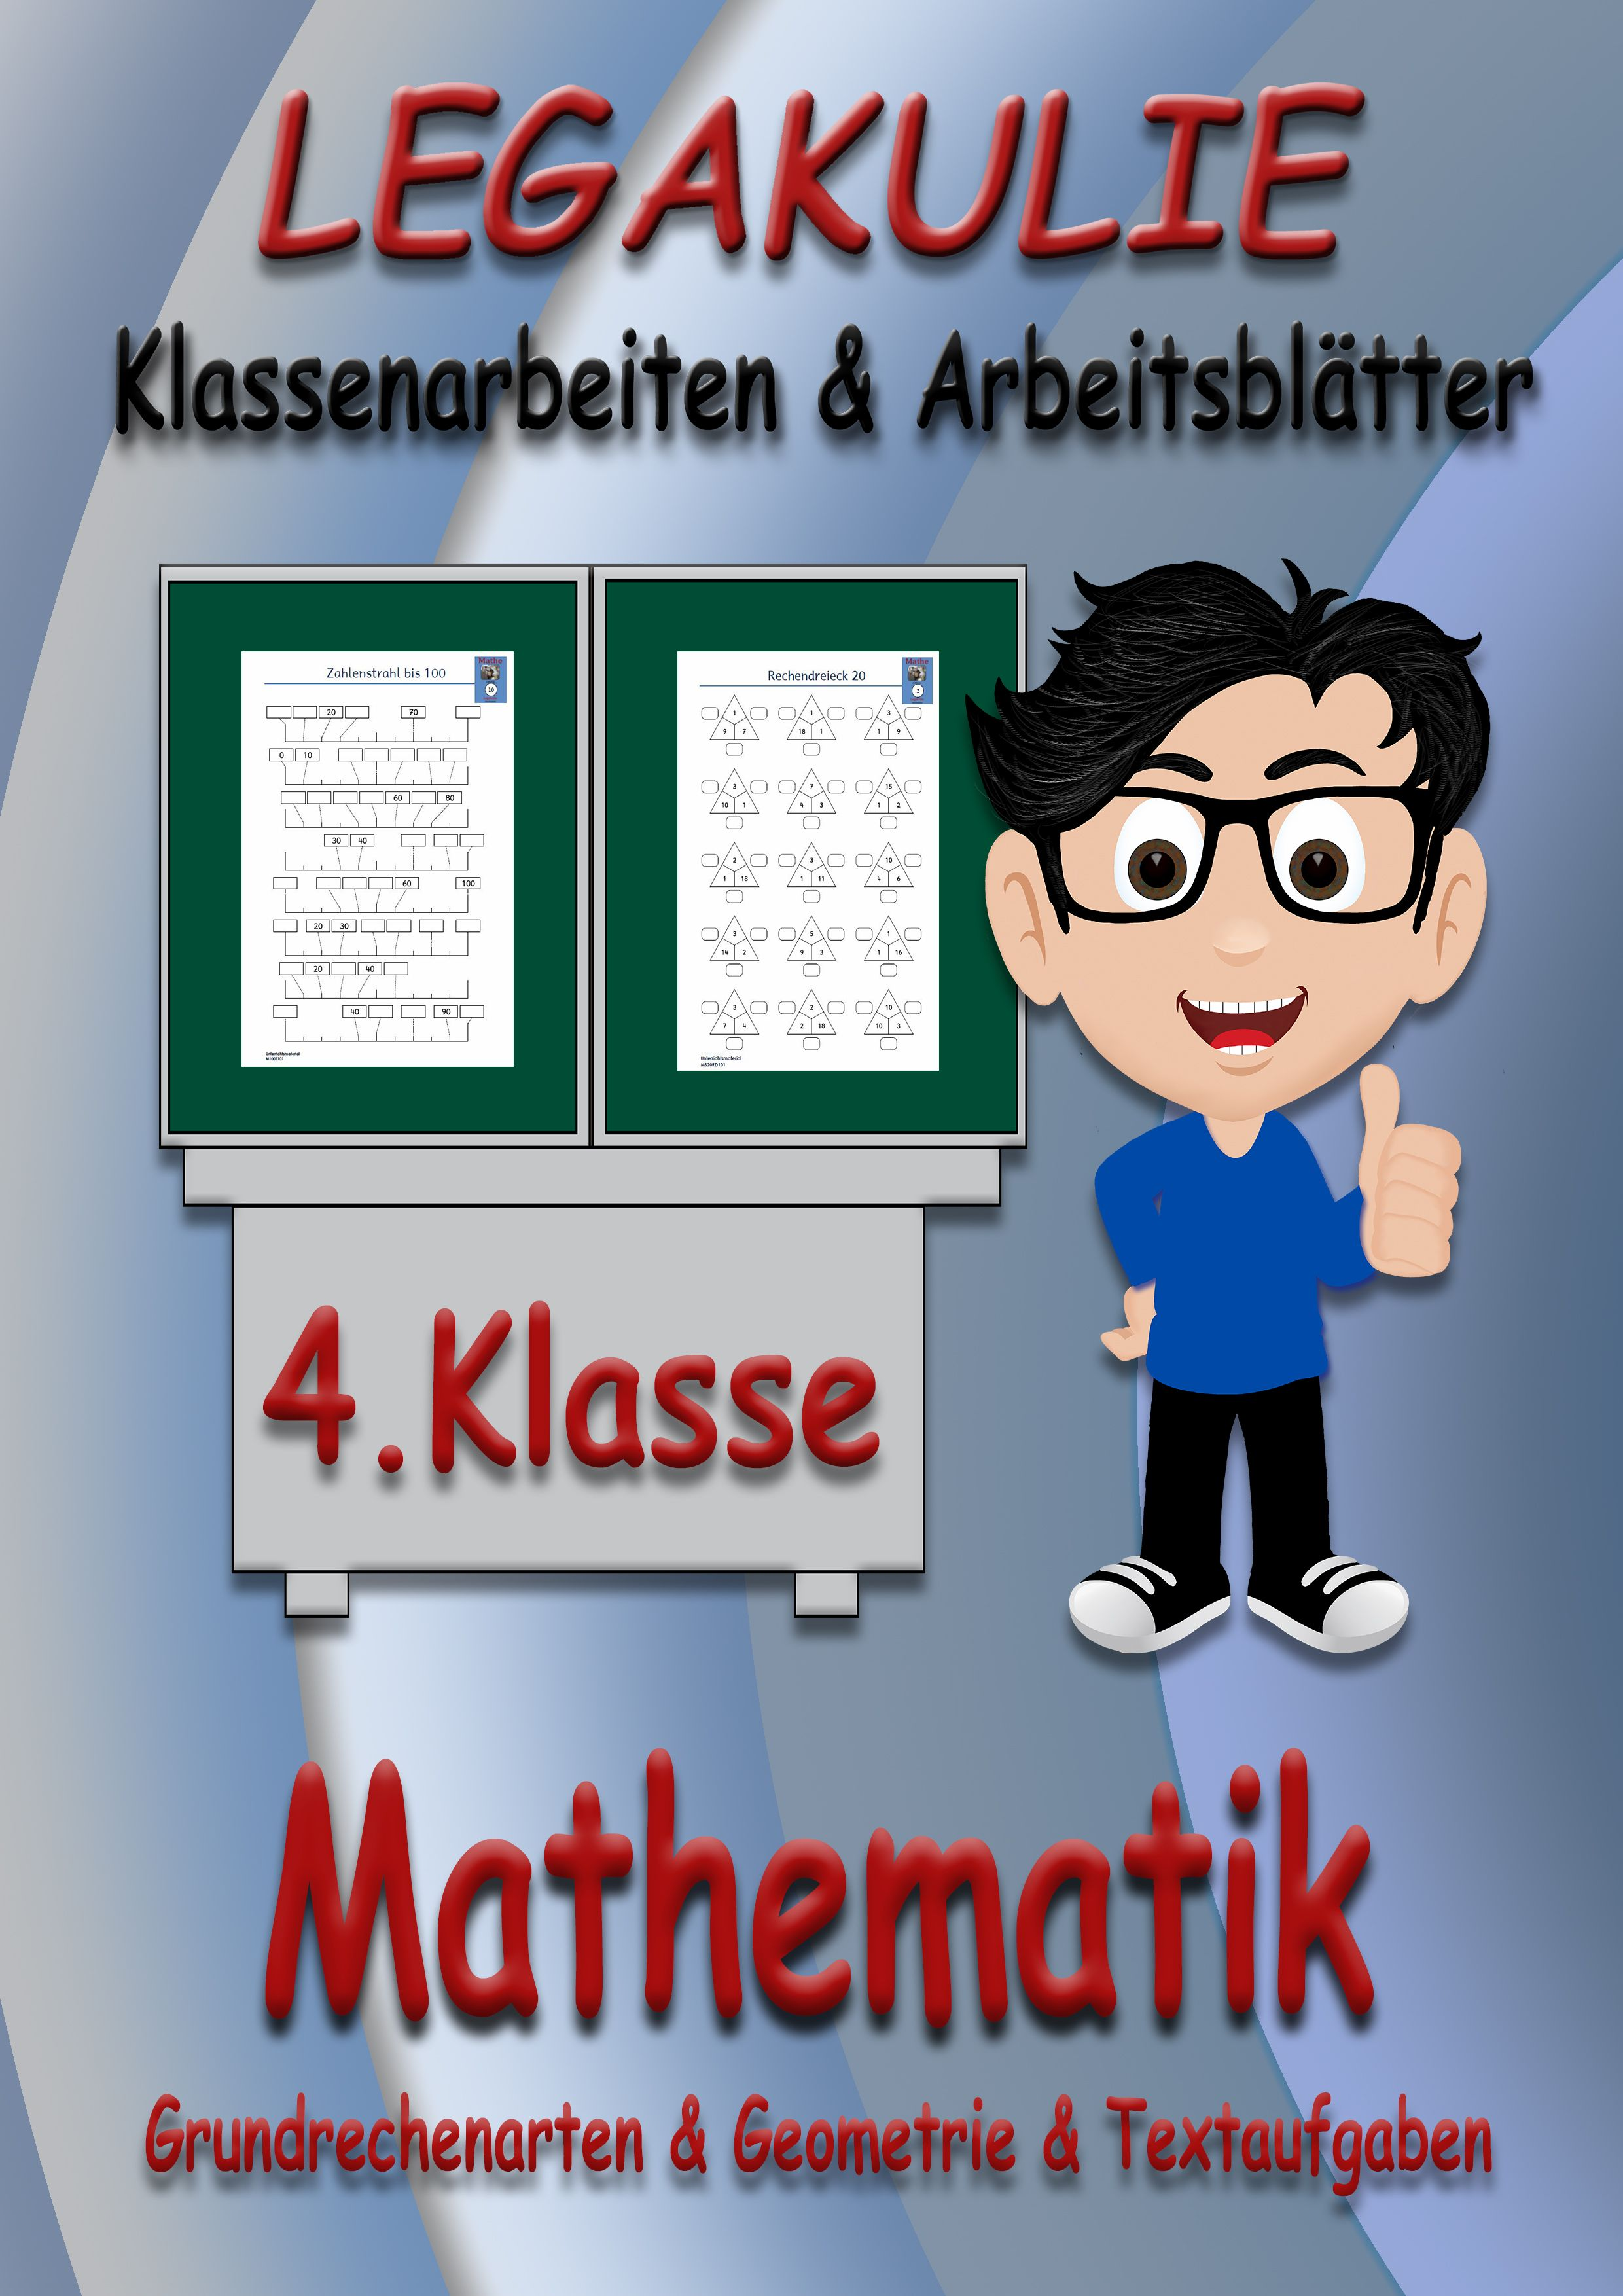 Mathematik #4Klasse #Arbeitsblatt #PDF Arbeitsblätter / Übungen ...